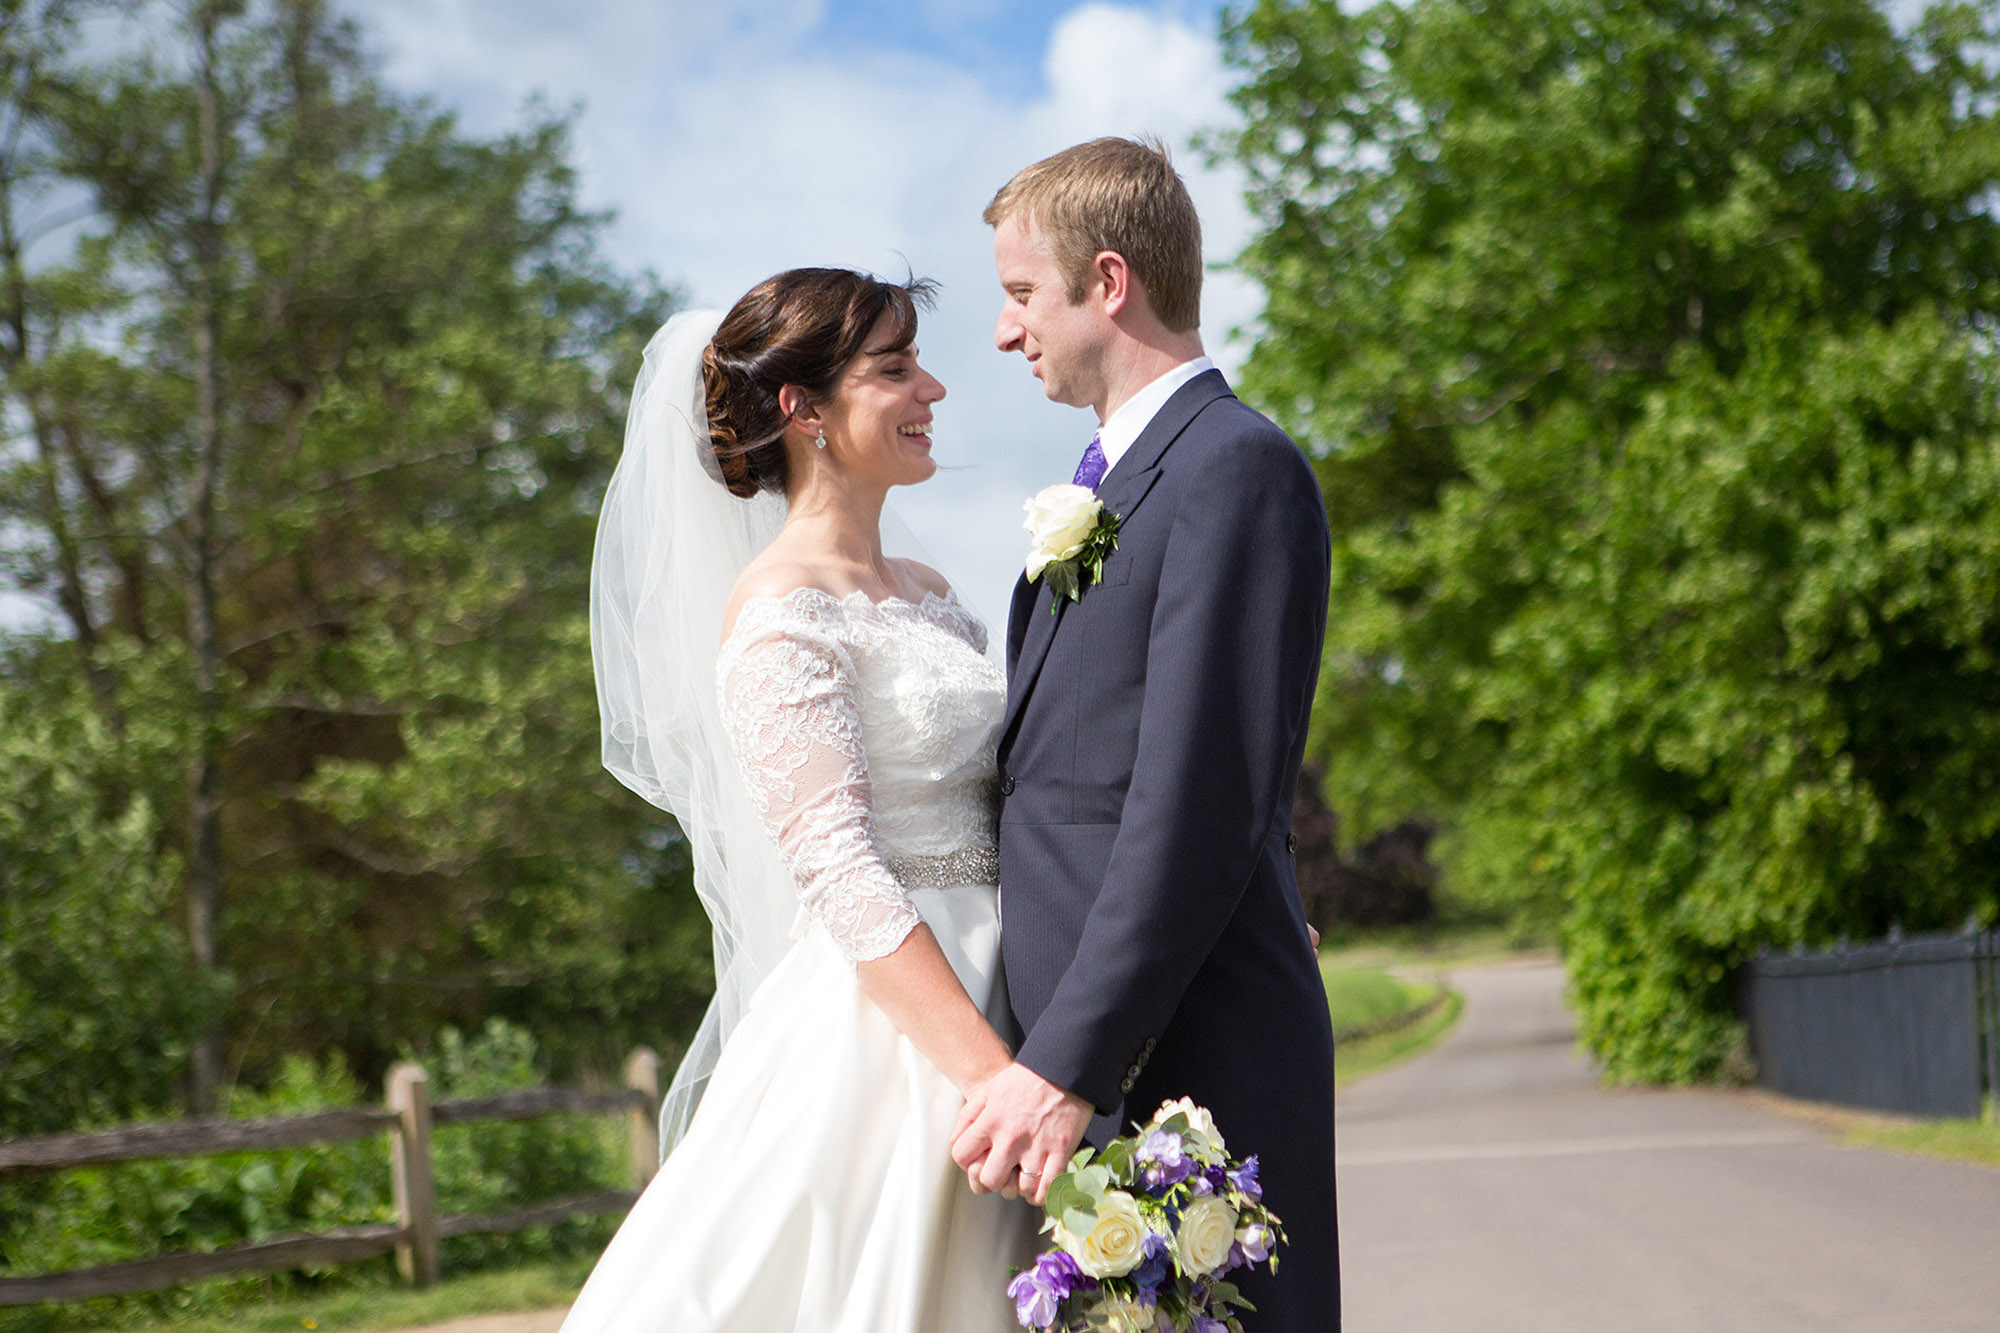 julia-toms-featured-weddings-west-sussex-008.jpg